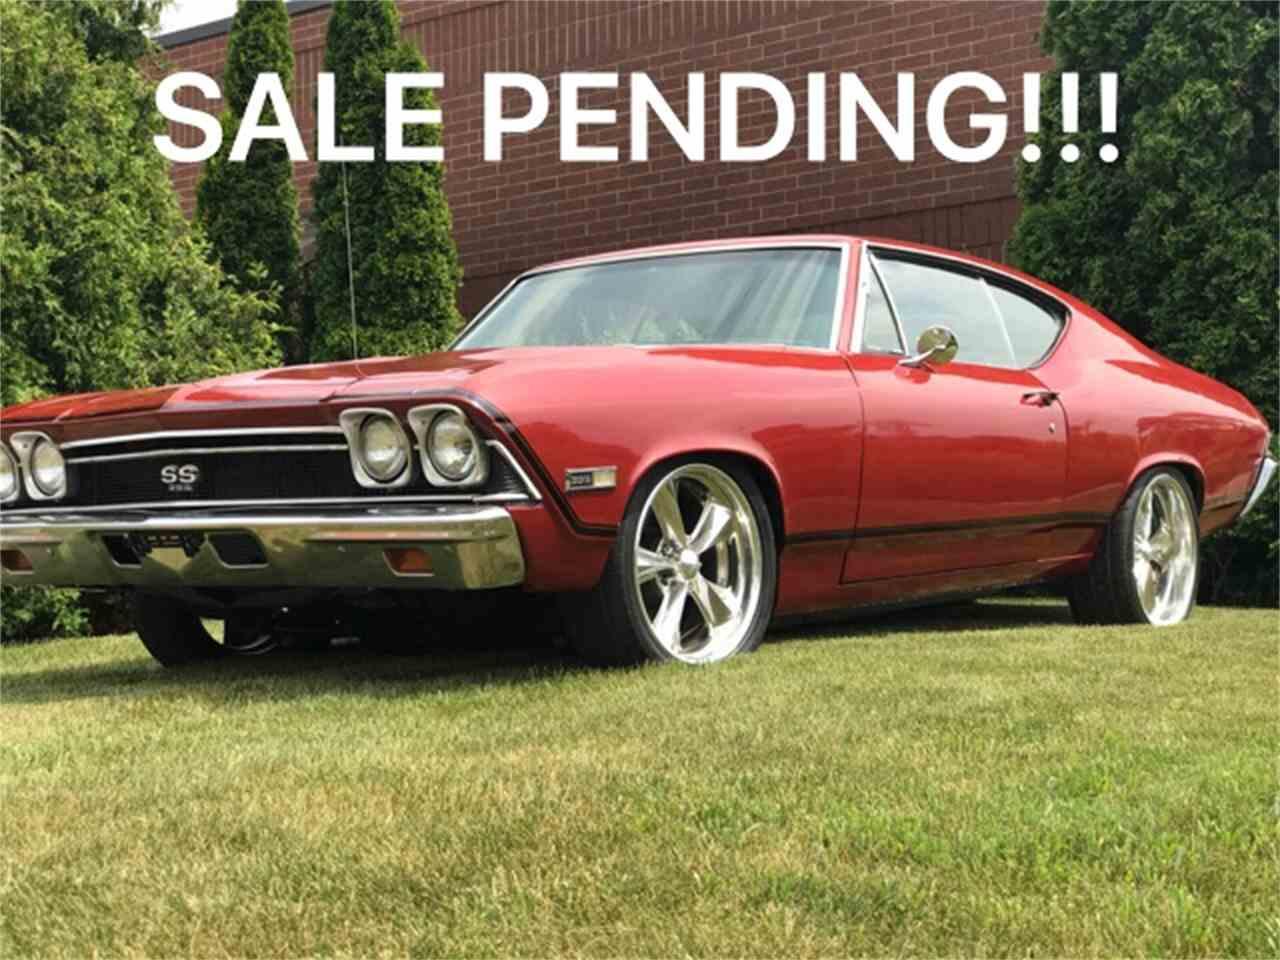 1968 Chevrolet Chevelle for Sale - CC-993138